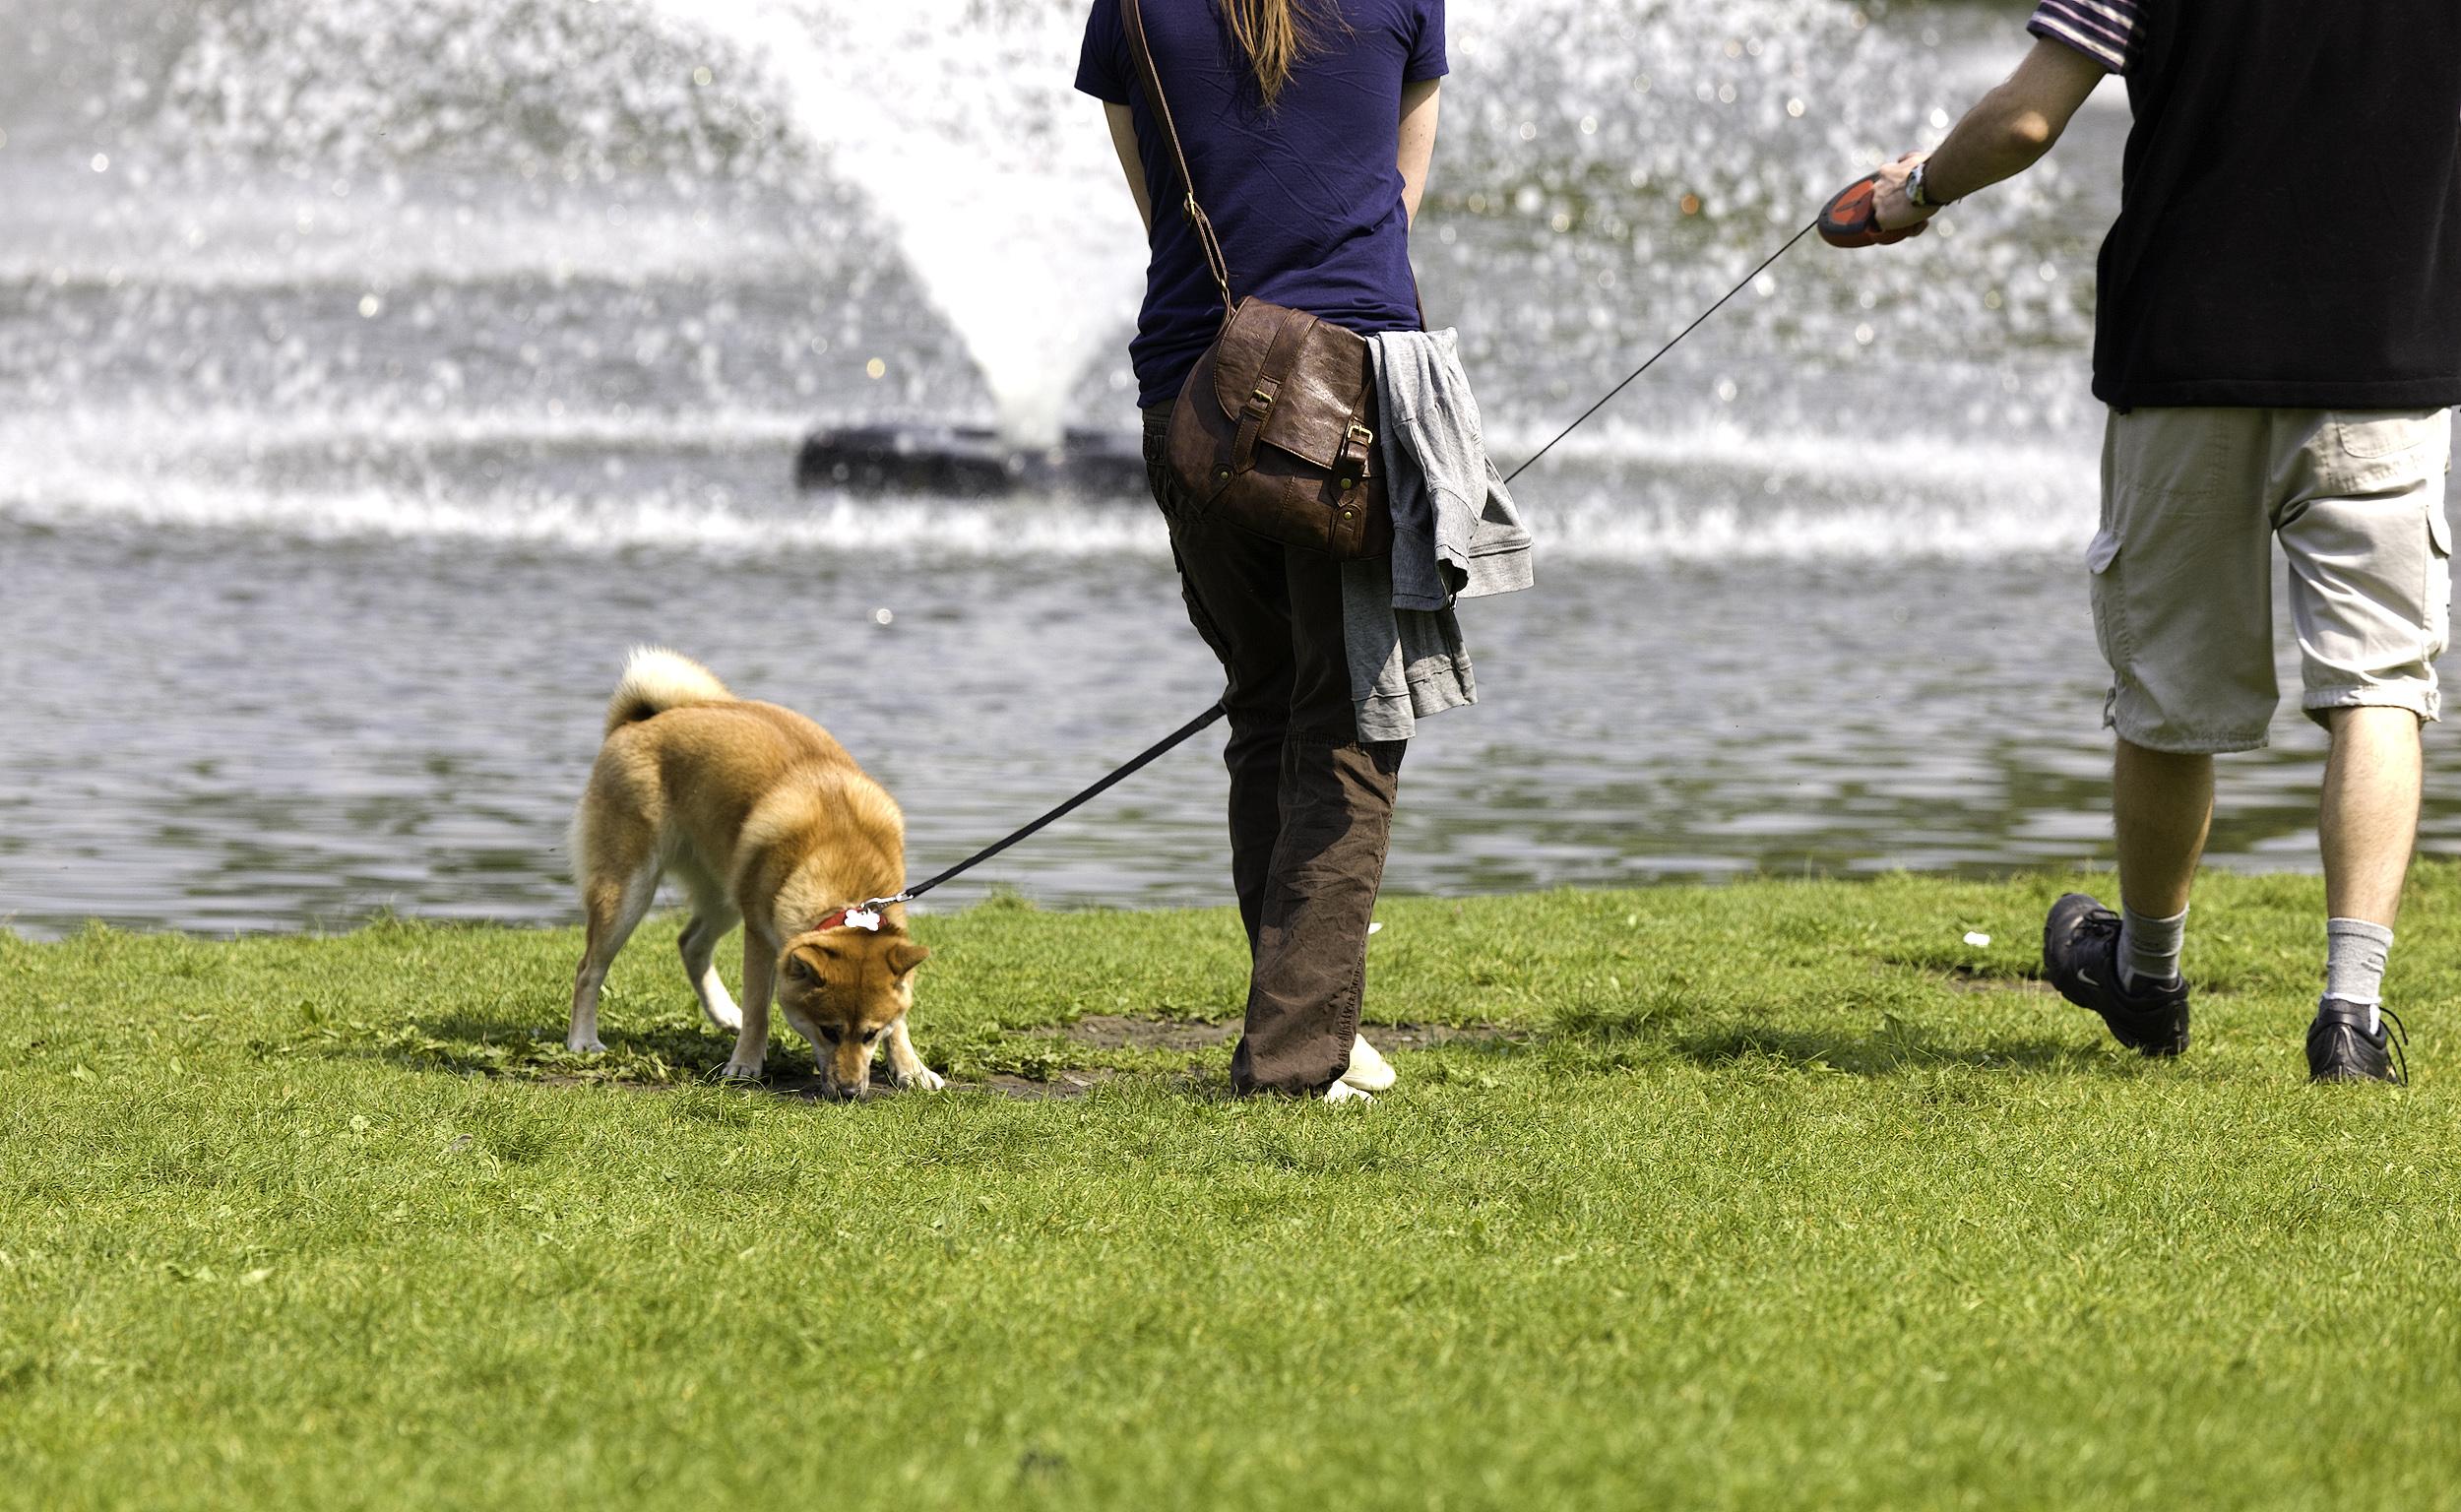 De mooiste Nederlandse parken om je hond uit te laten